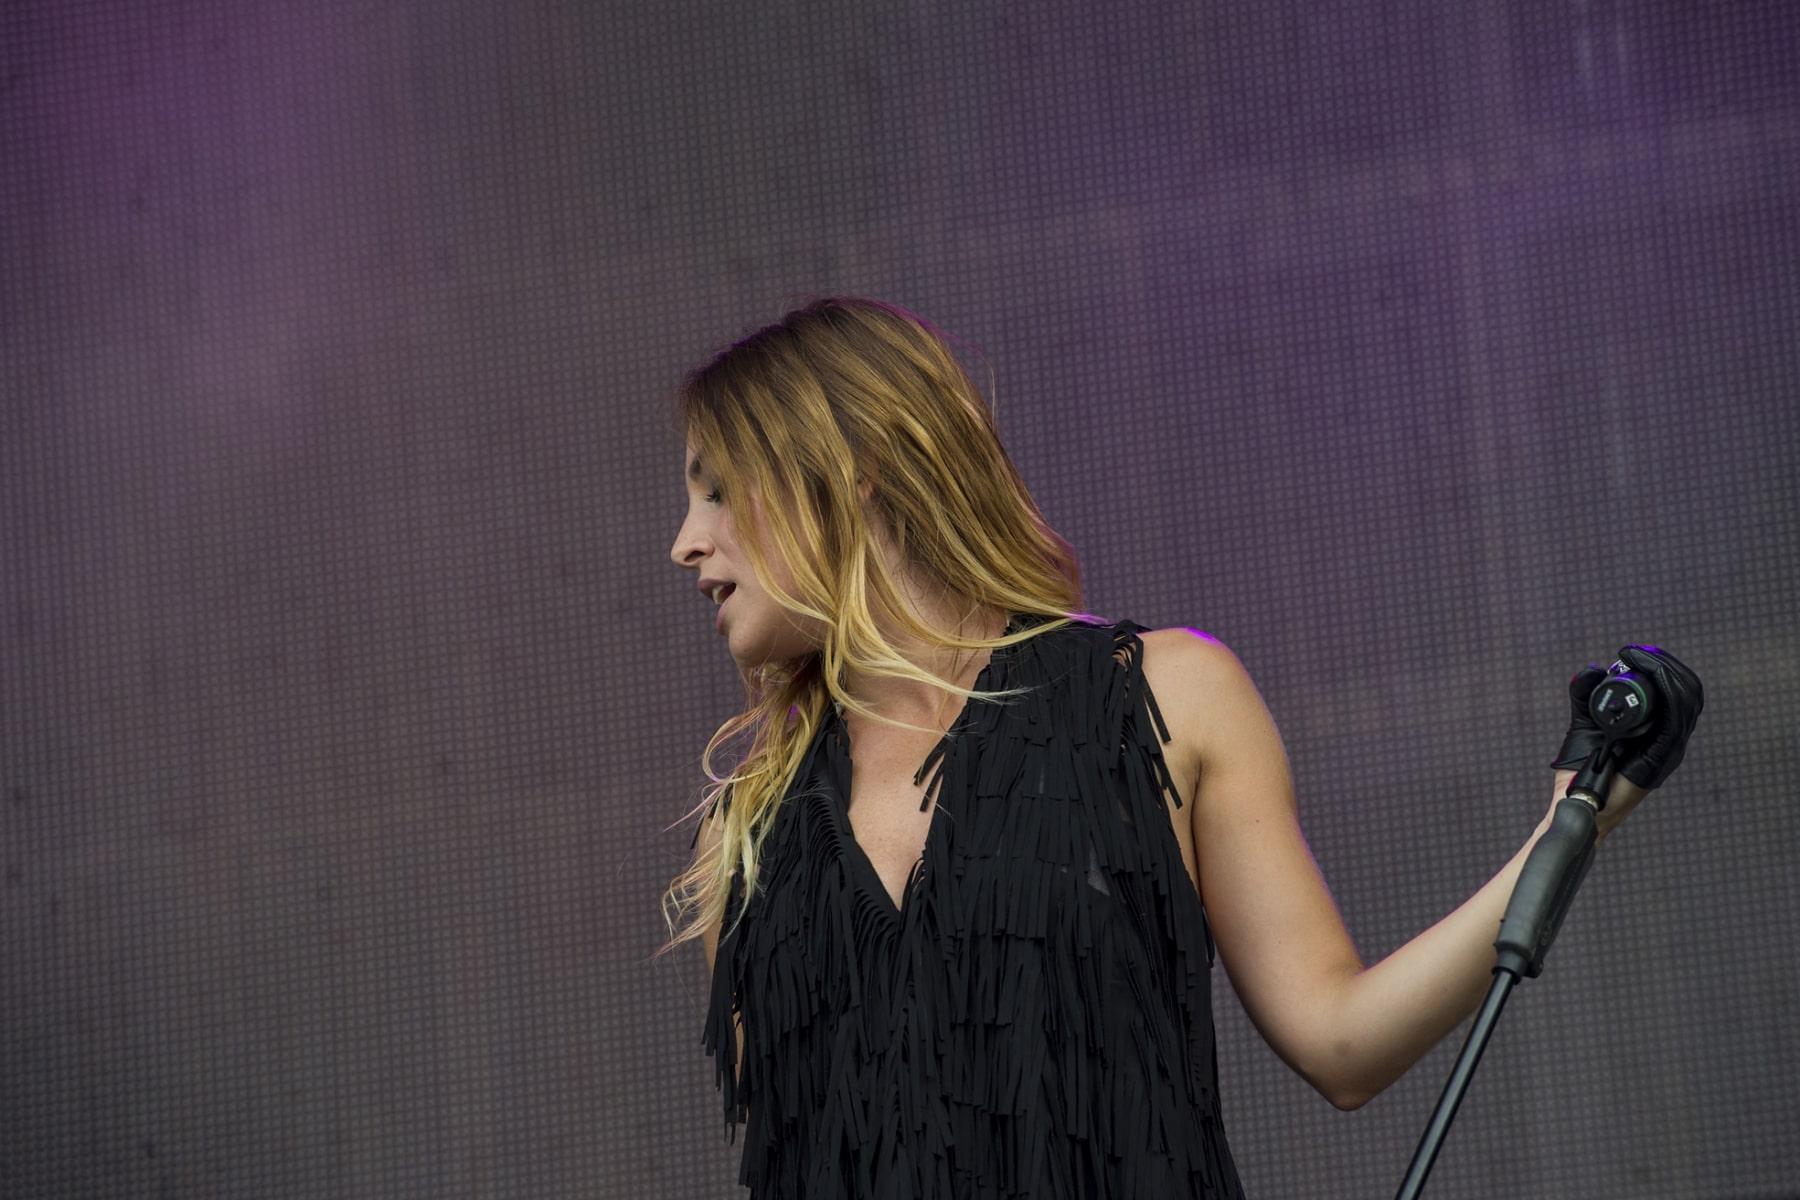 gibraltar-music-festival-2013-la-oreja-de-van-gogh_9699935455_o